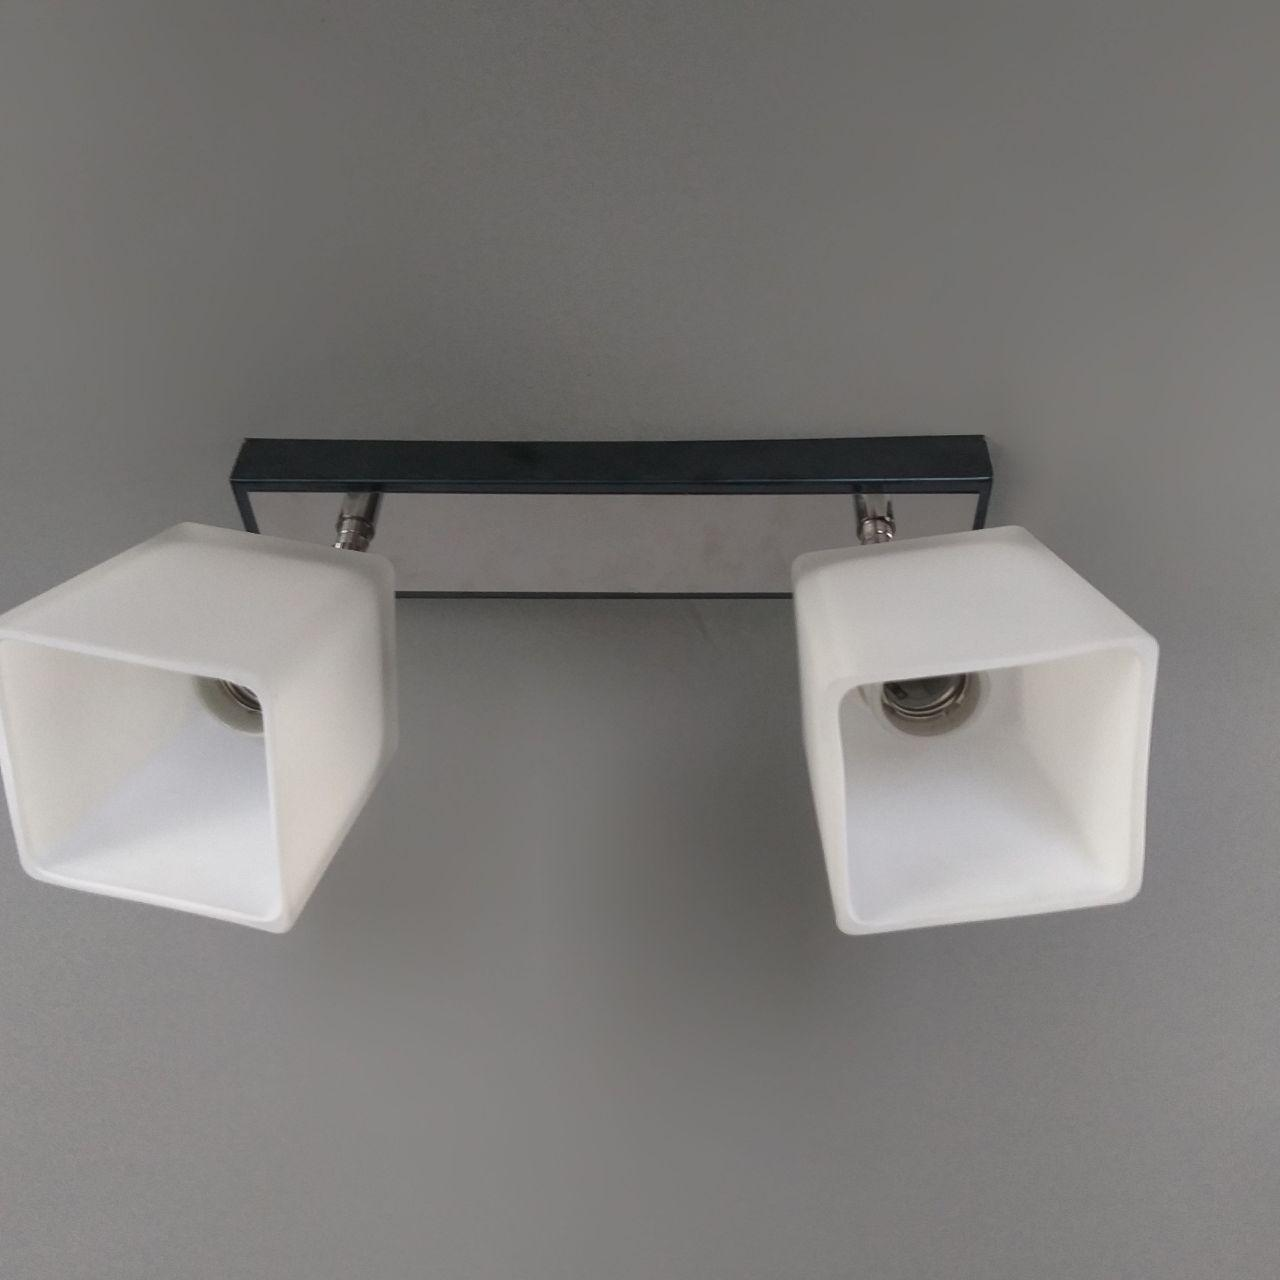 Люстра потолочная на 2 лампы 06-51203/2 CR+черн.жемчуг(ZZH)+WT